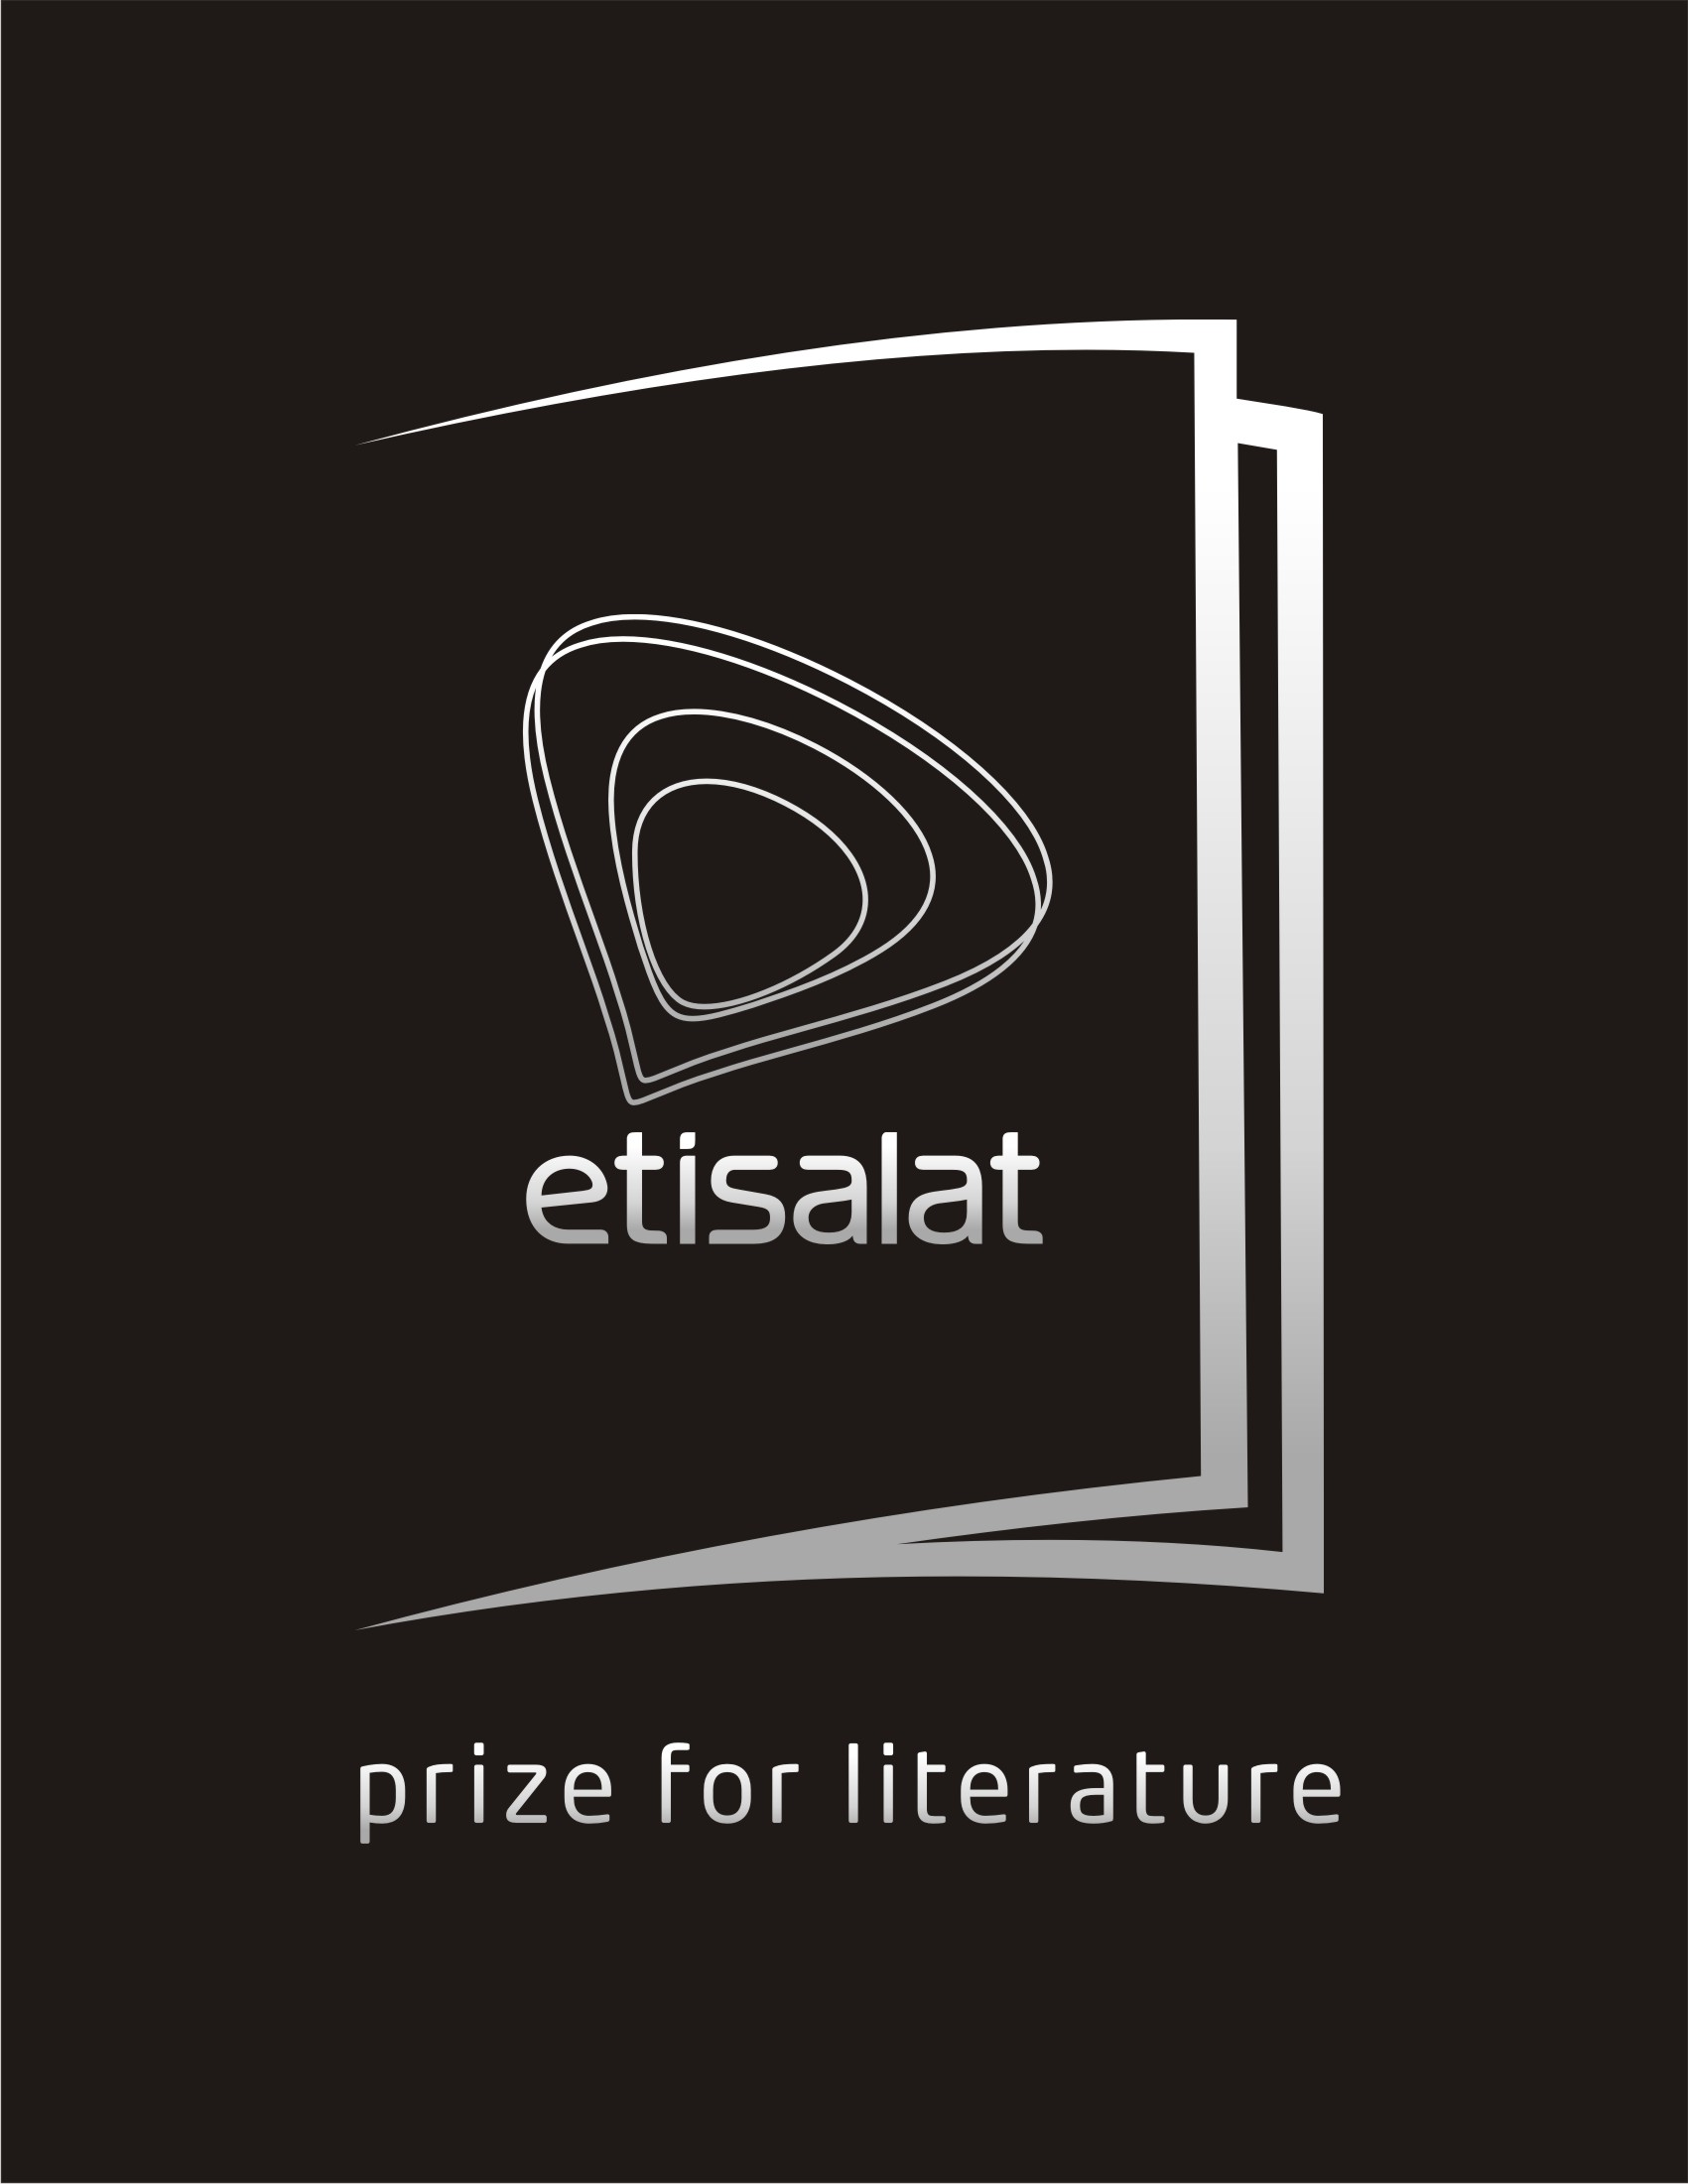 Etisalat_Prize_for_Literature_Logo